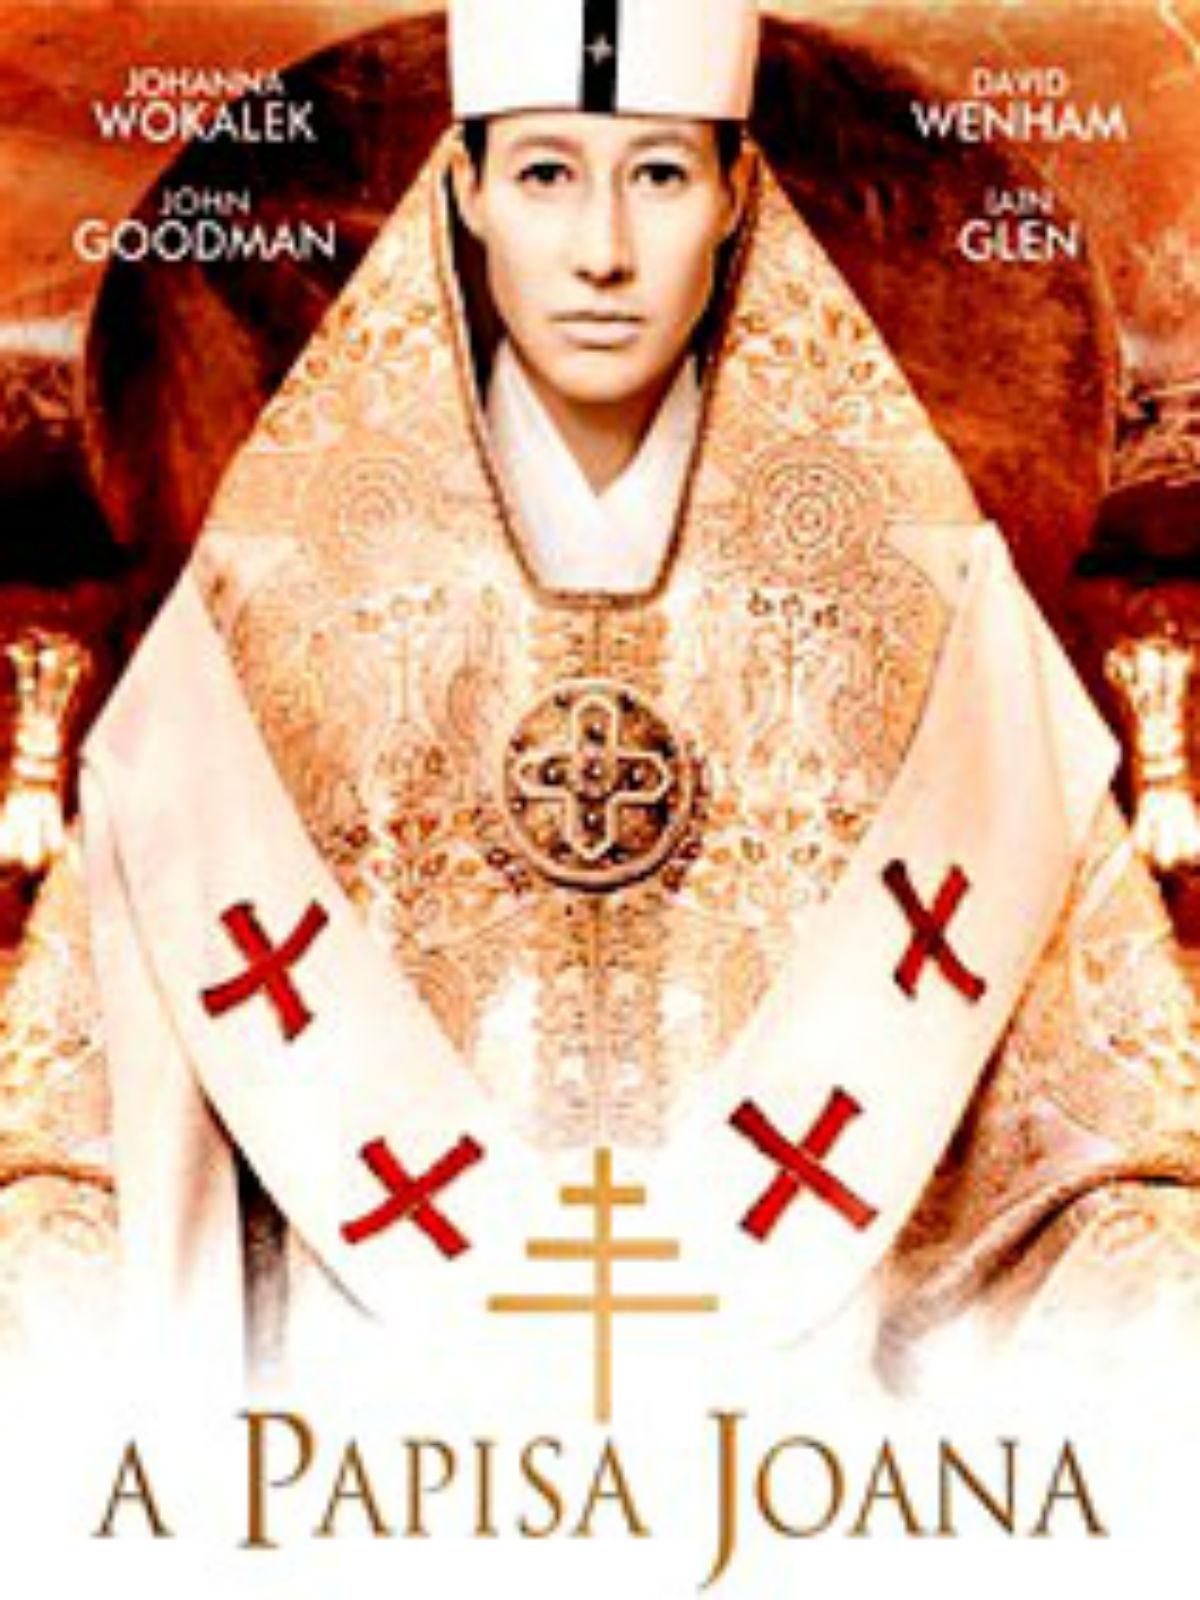 A Papisa Joana Filme 2009 Adorocinema